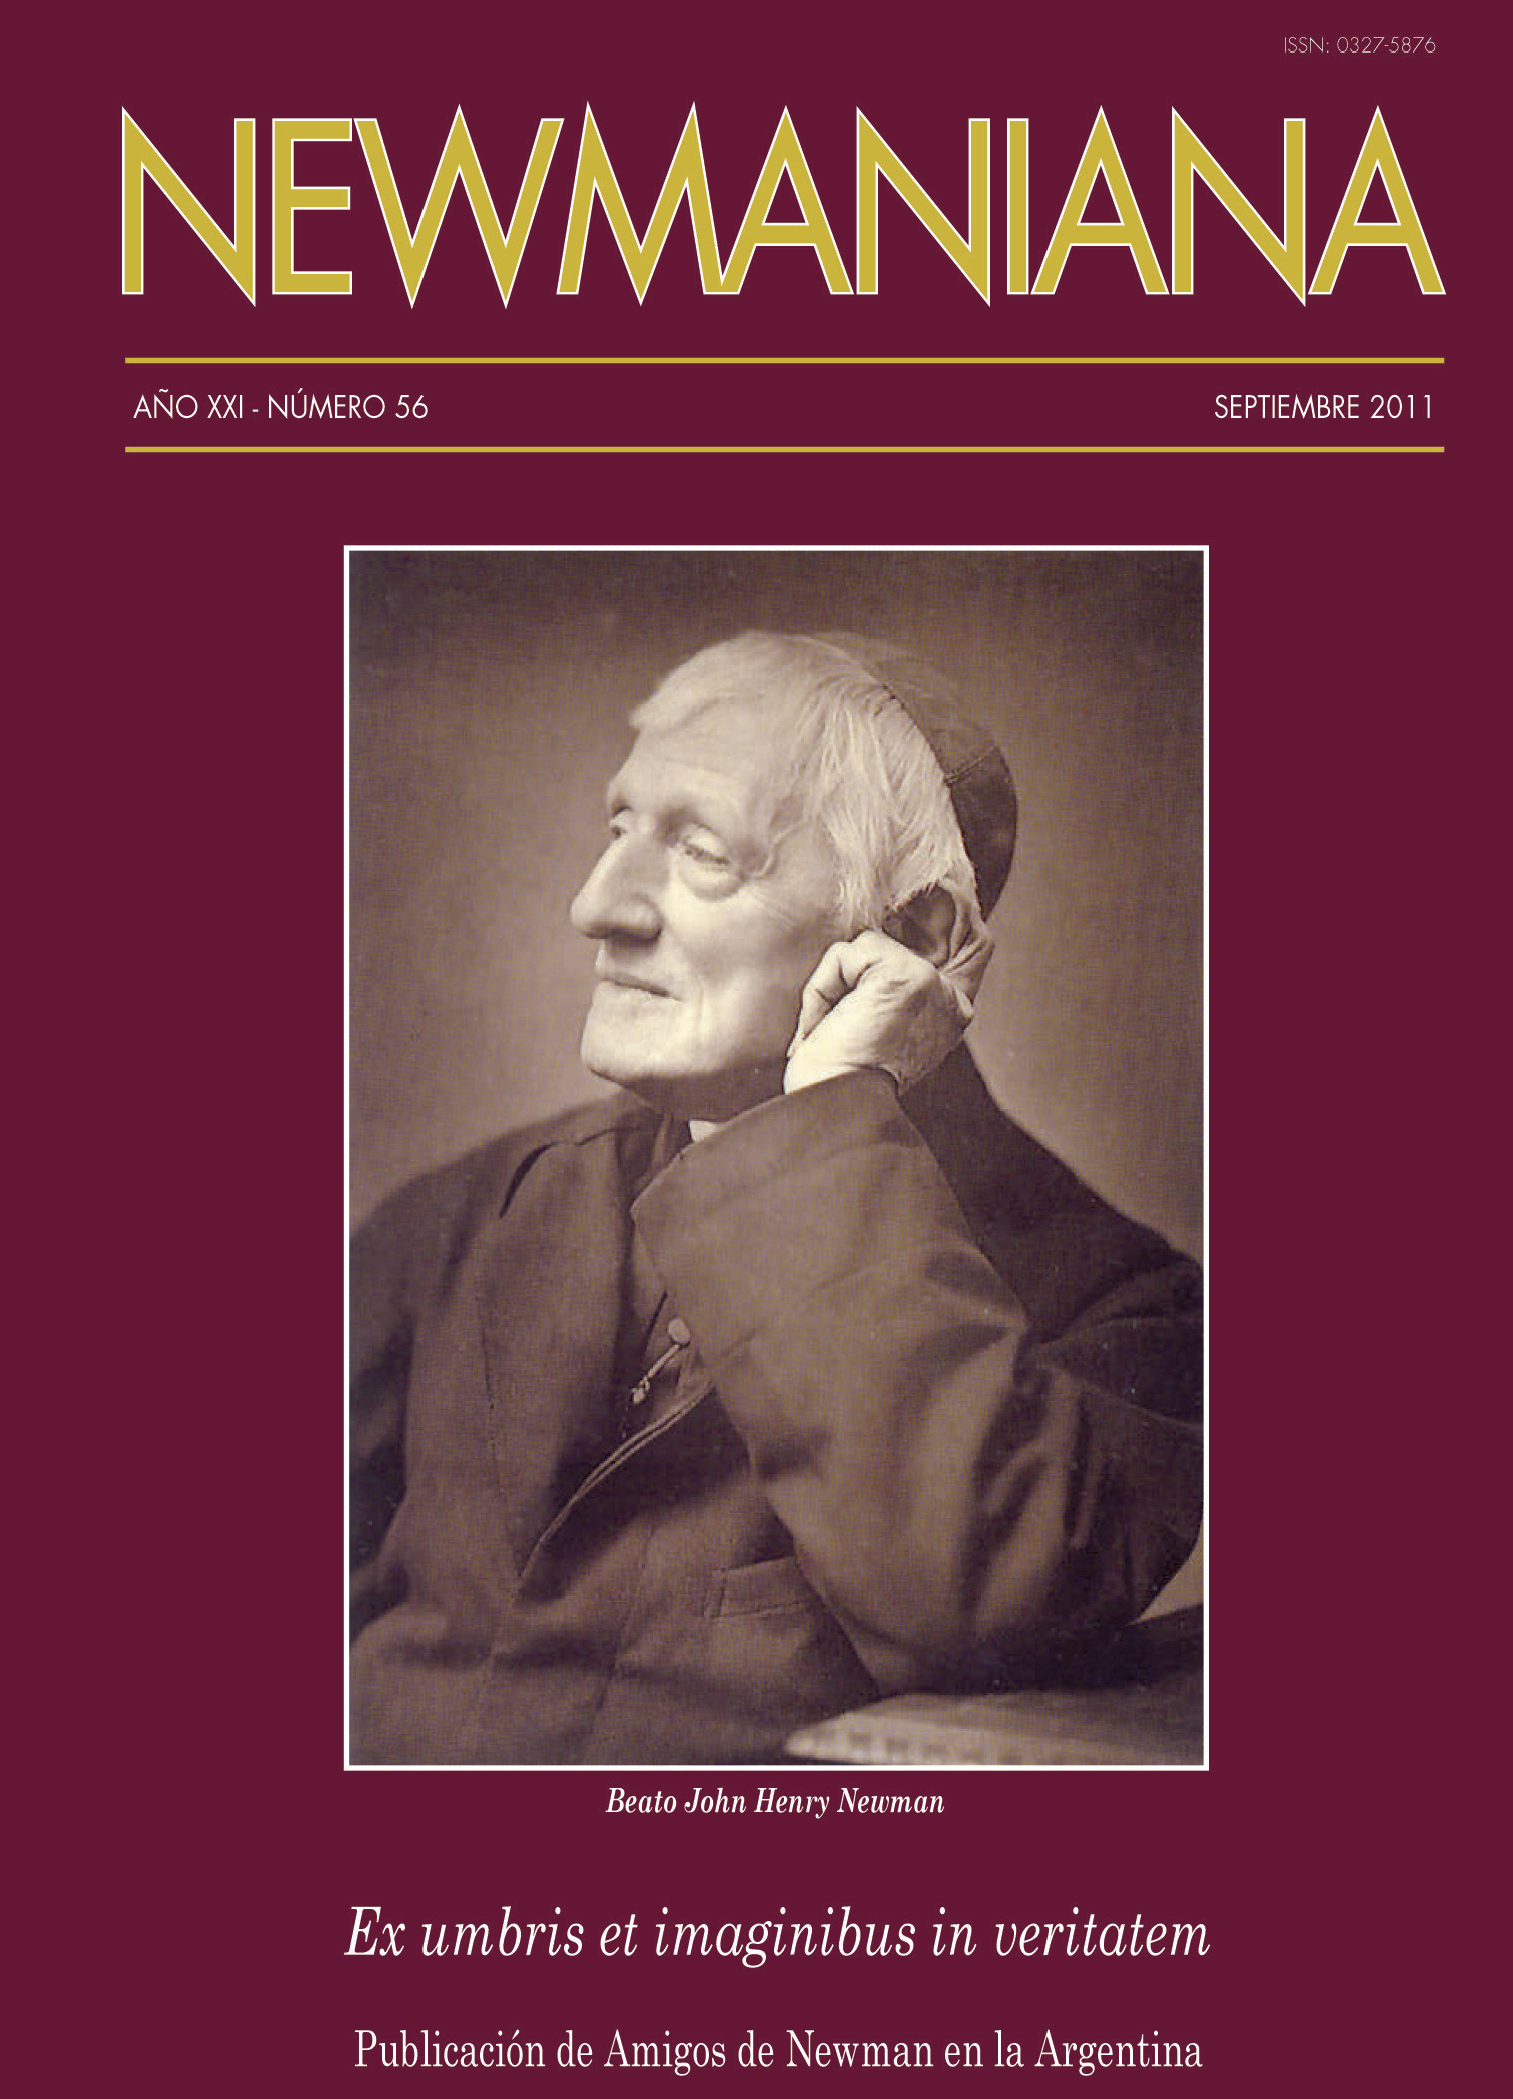 Revista Newmaniana 56 – Septiembre 2011